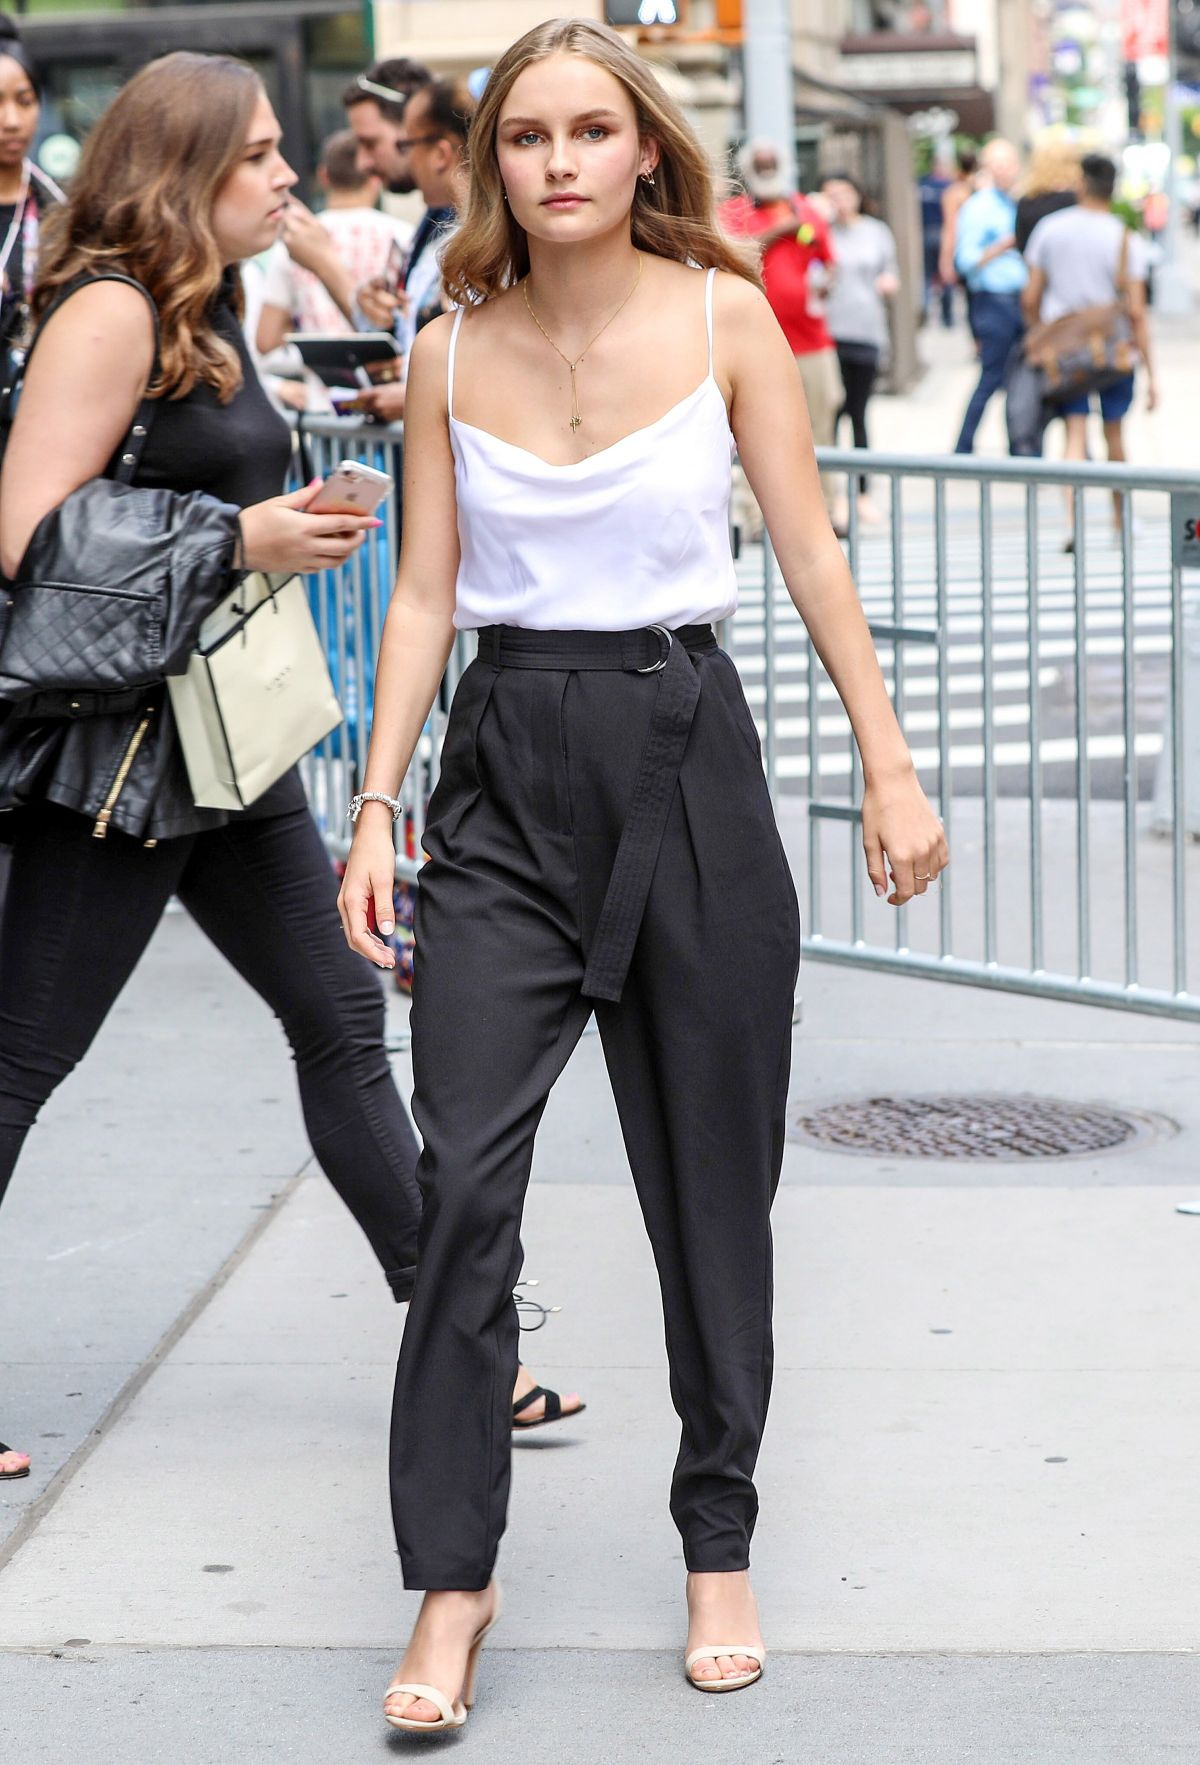 Olivia DeJonge nudes (21 photo), Ass, Leaked, Instagram, butt 2018